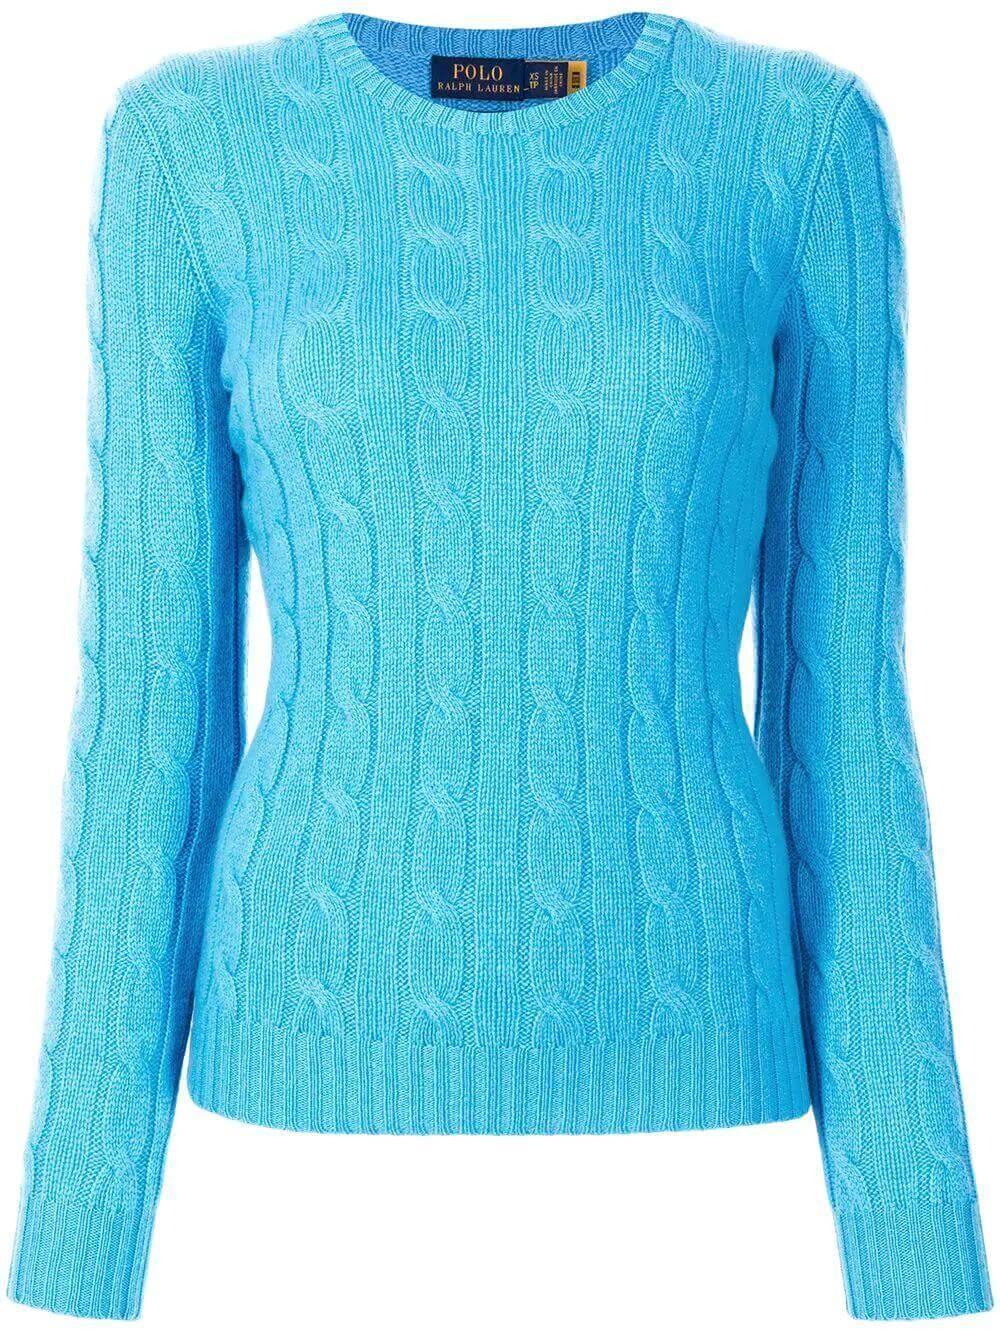 Juliana Sweater Item # 211780379027